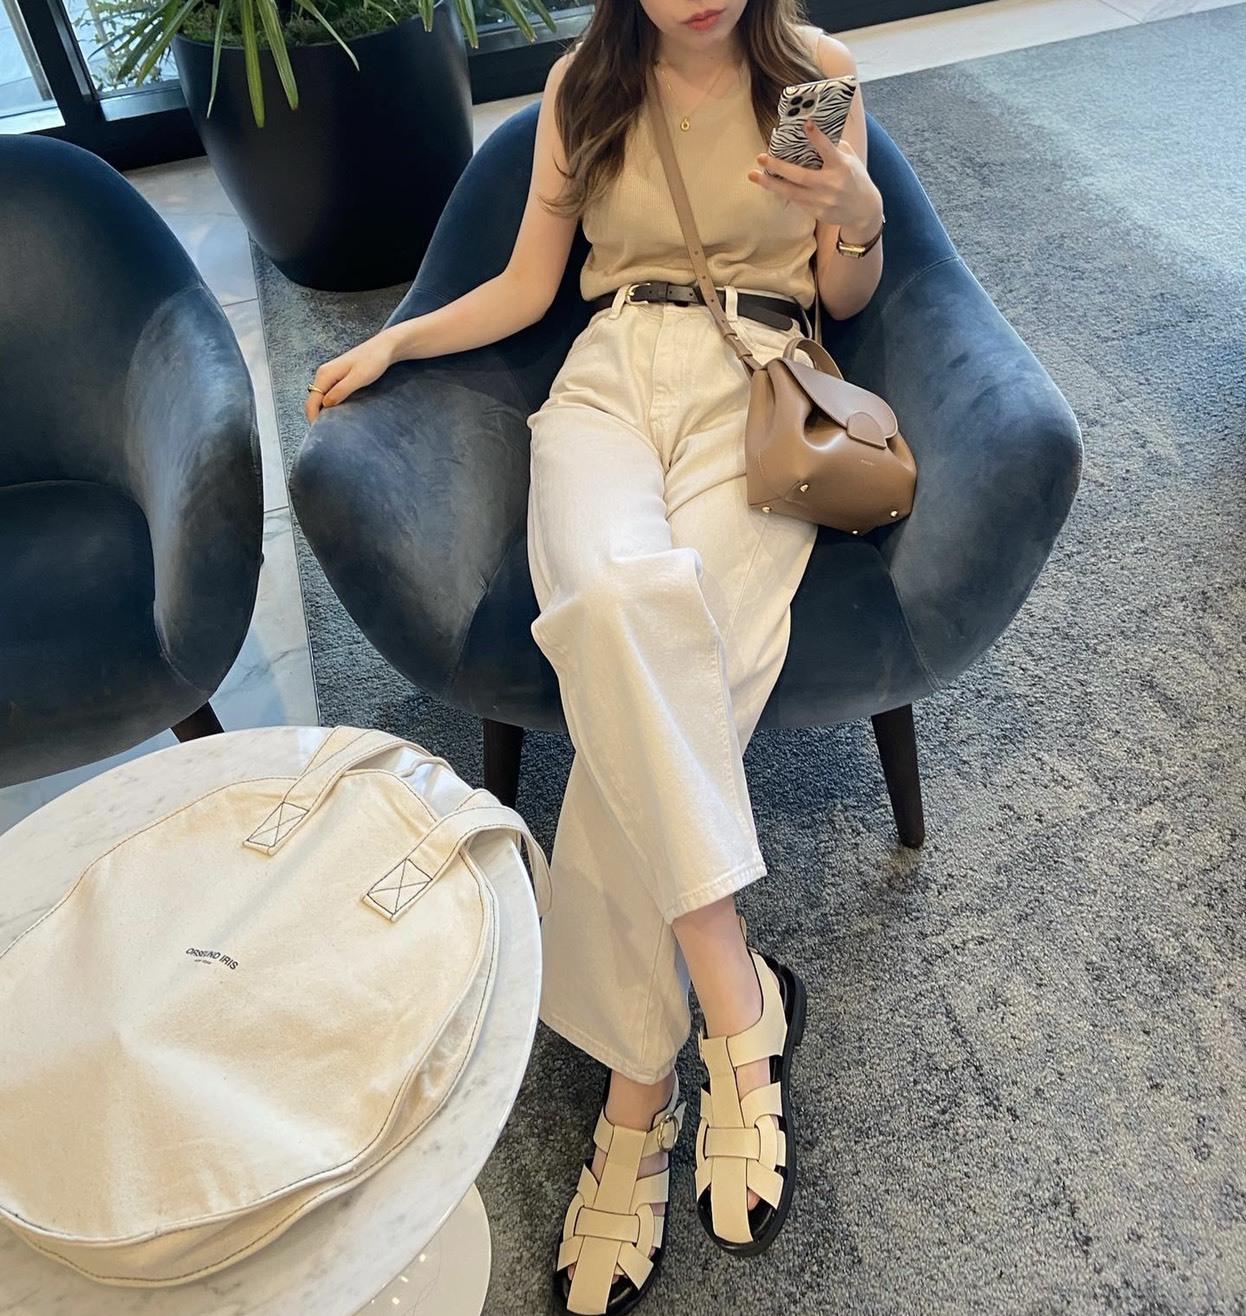 DAYNYC sleeveless tops(beige)